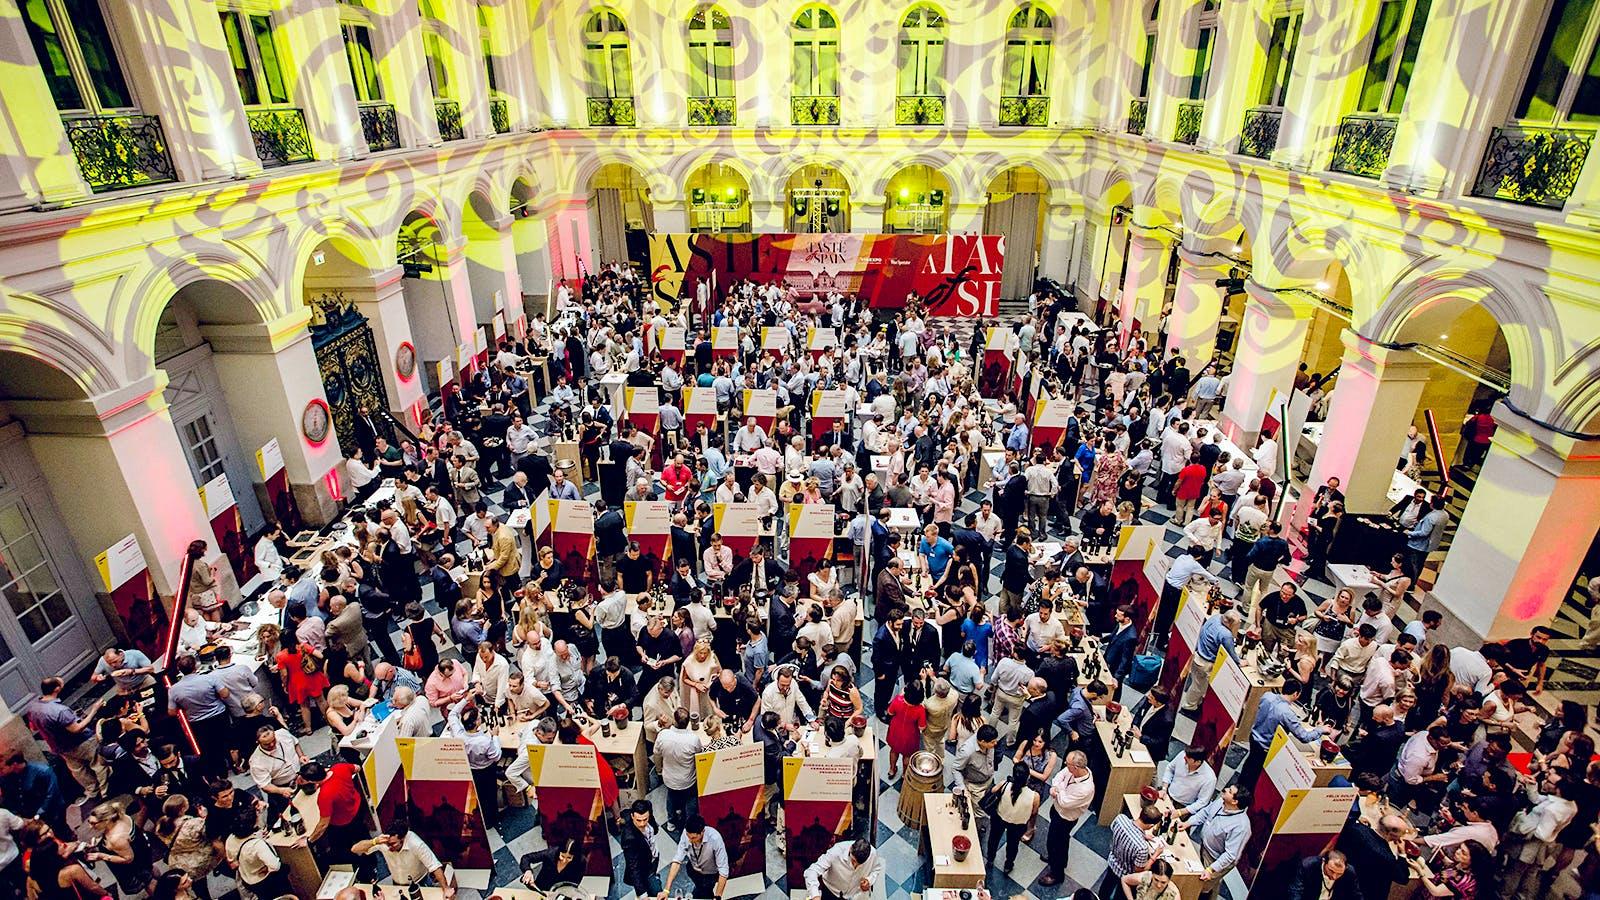 Vinexpo in Bordeaux Gets a 'Taste of Spain'